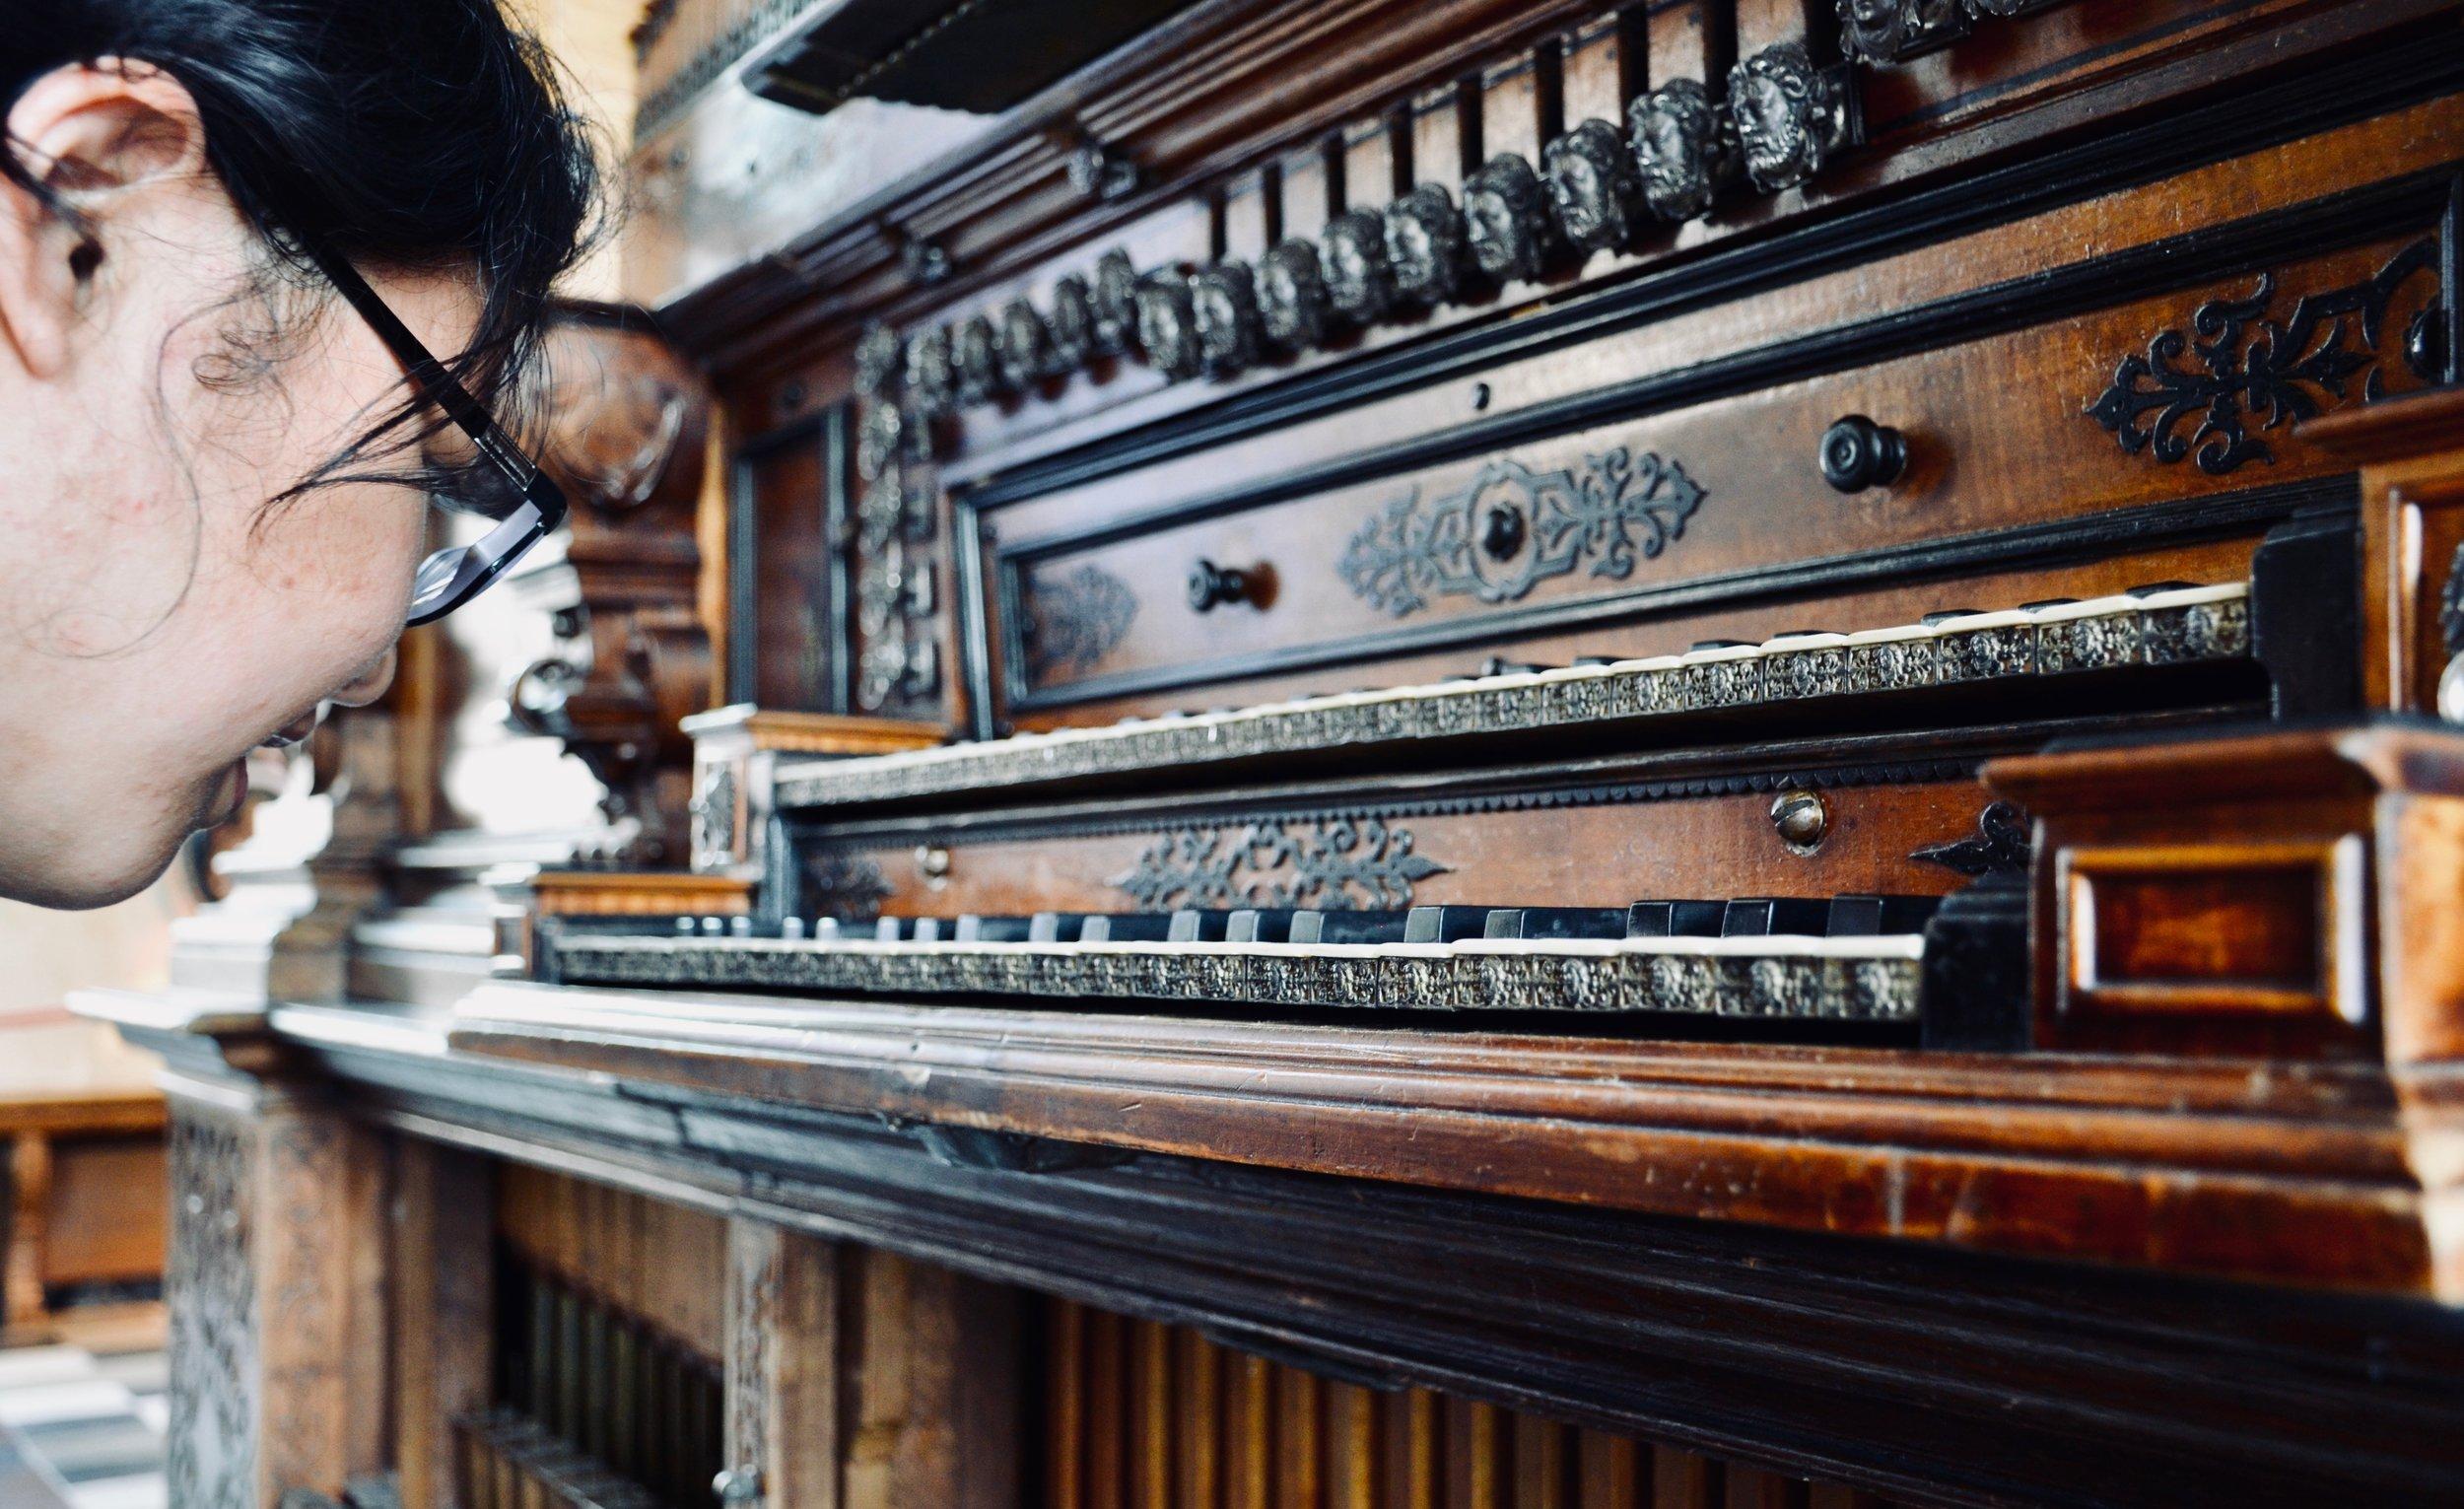 Jennifer Hsiao admires the keyboard carvings, 1610 Compenius organ, Frederiksborg Castle, Hillerød, Denmark.